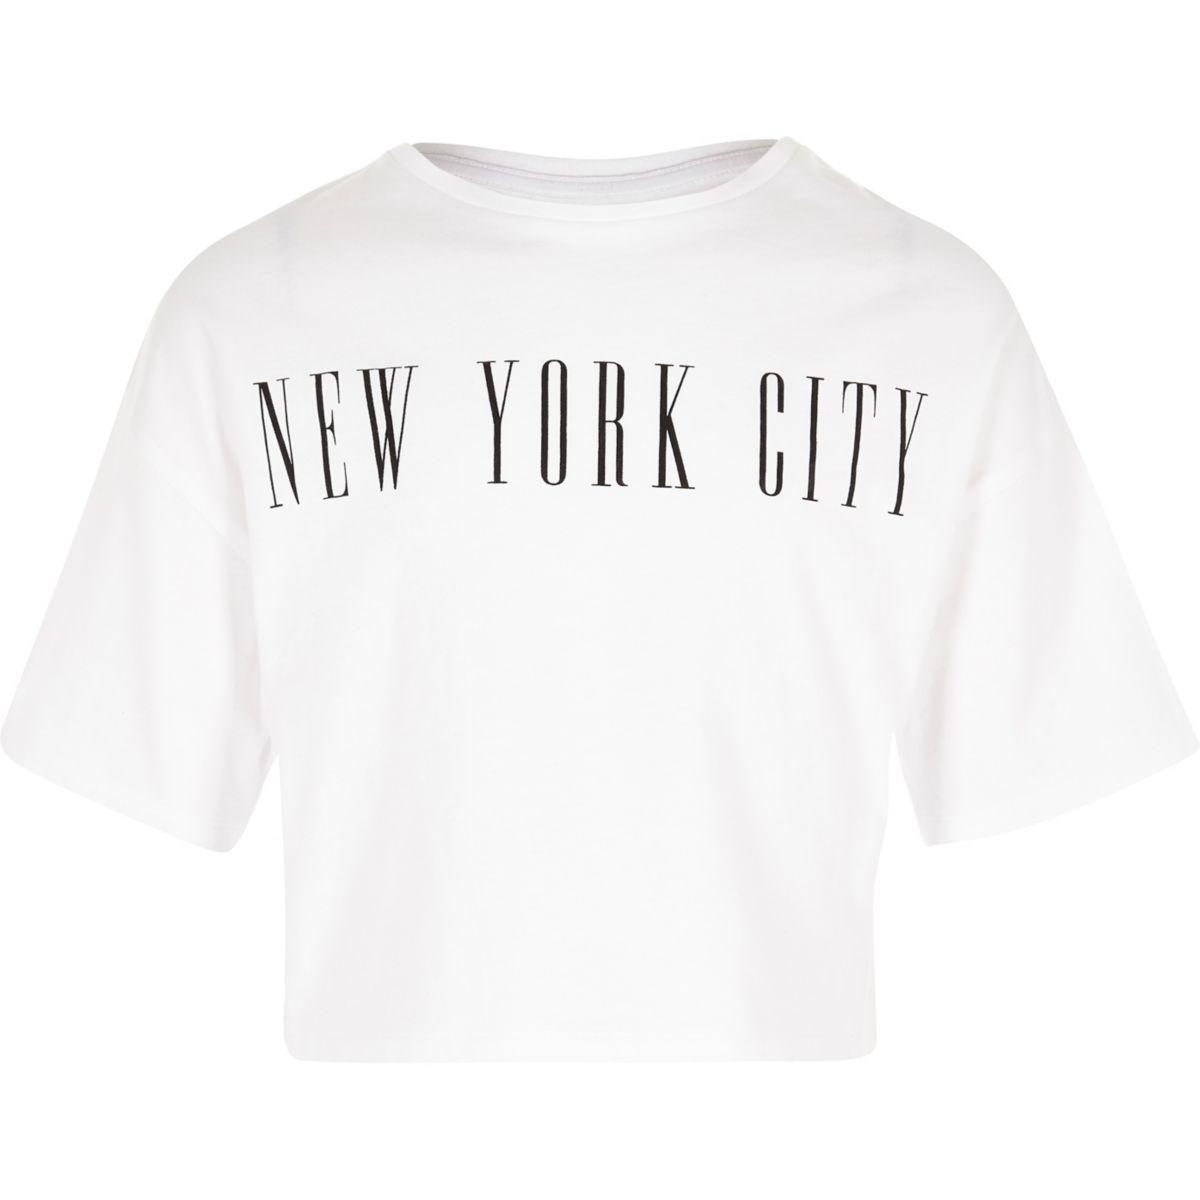 T-shirt court blanc « New York City » pour fille